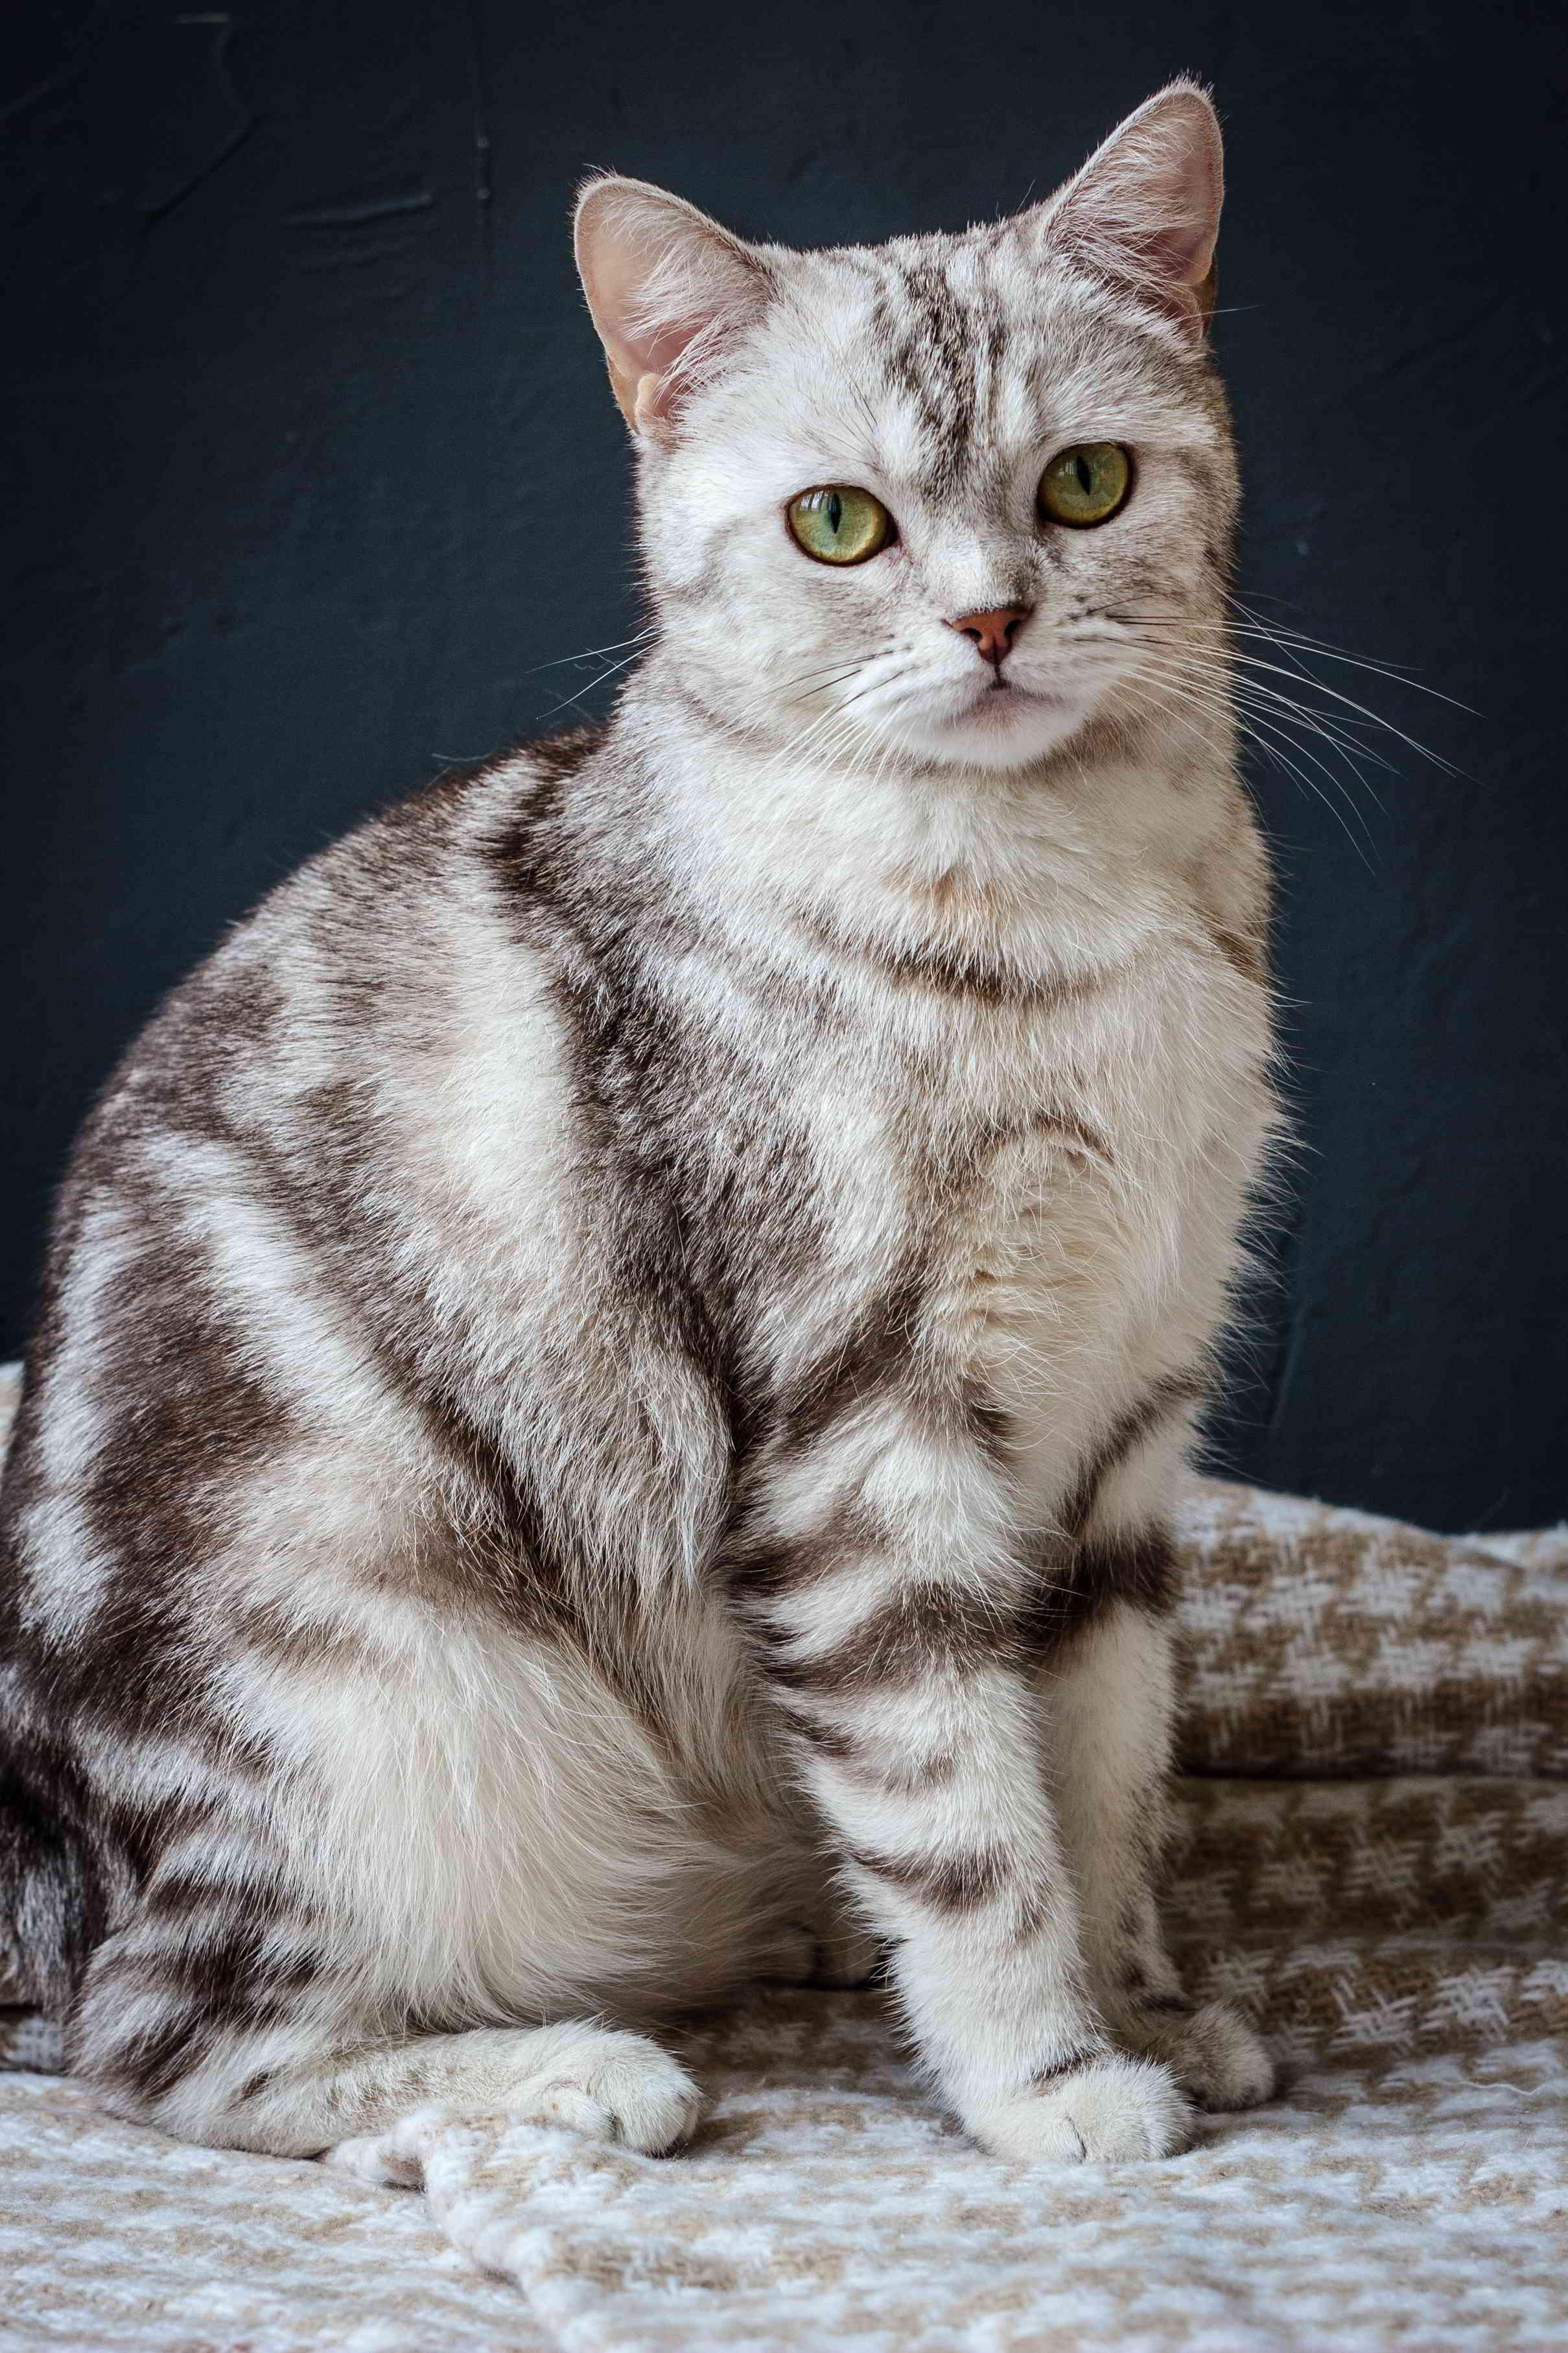 Download Adorable Cat Pictures Photos Images nfE6ekq7k